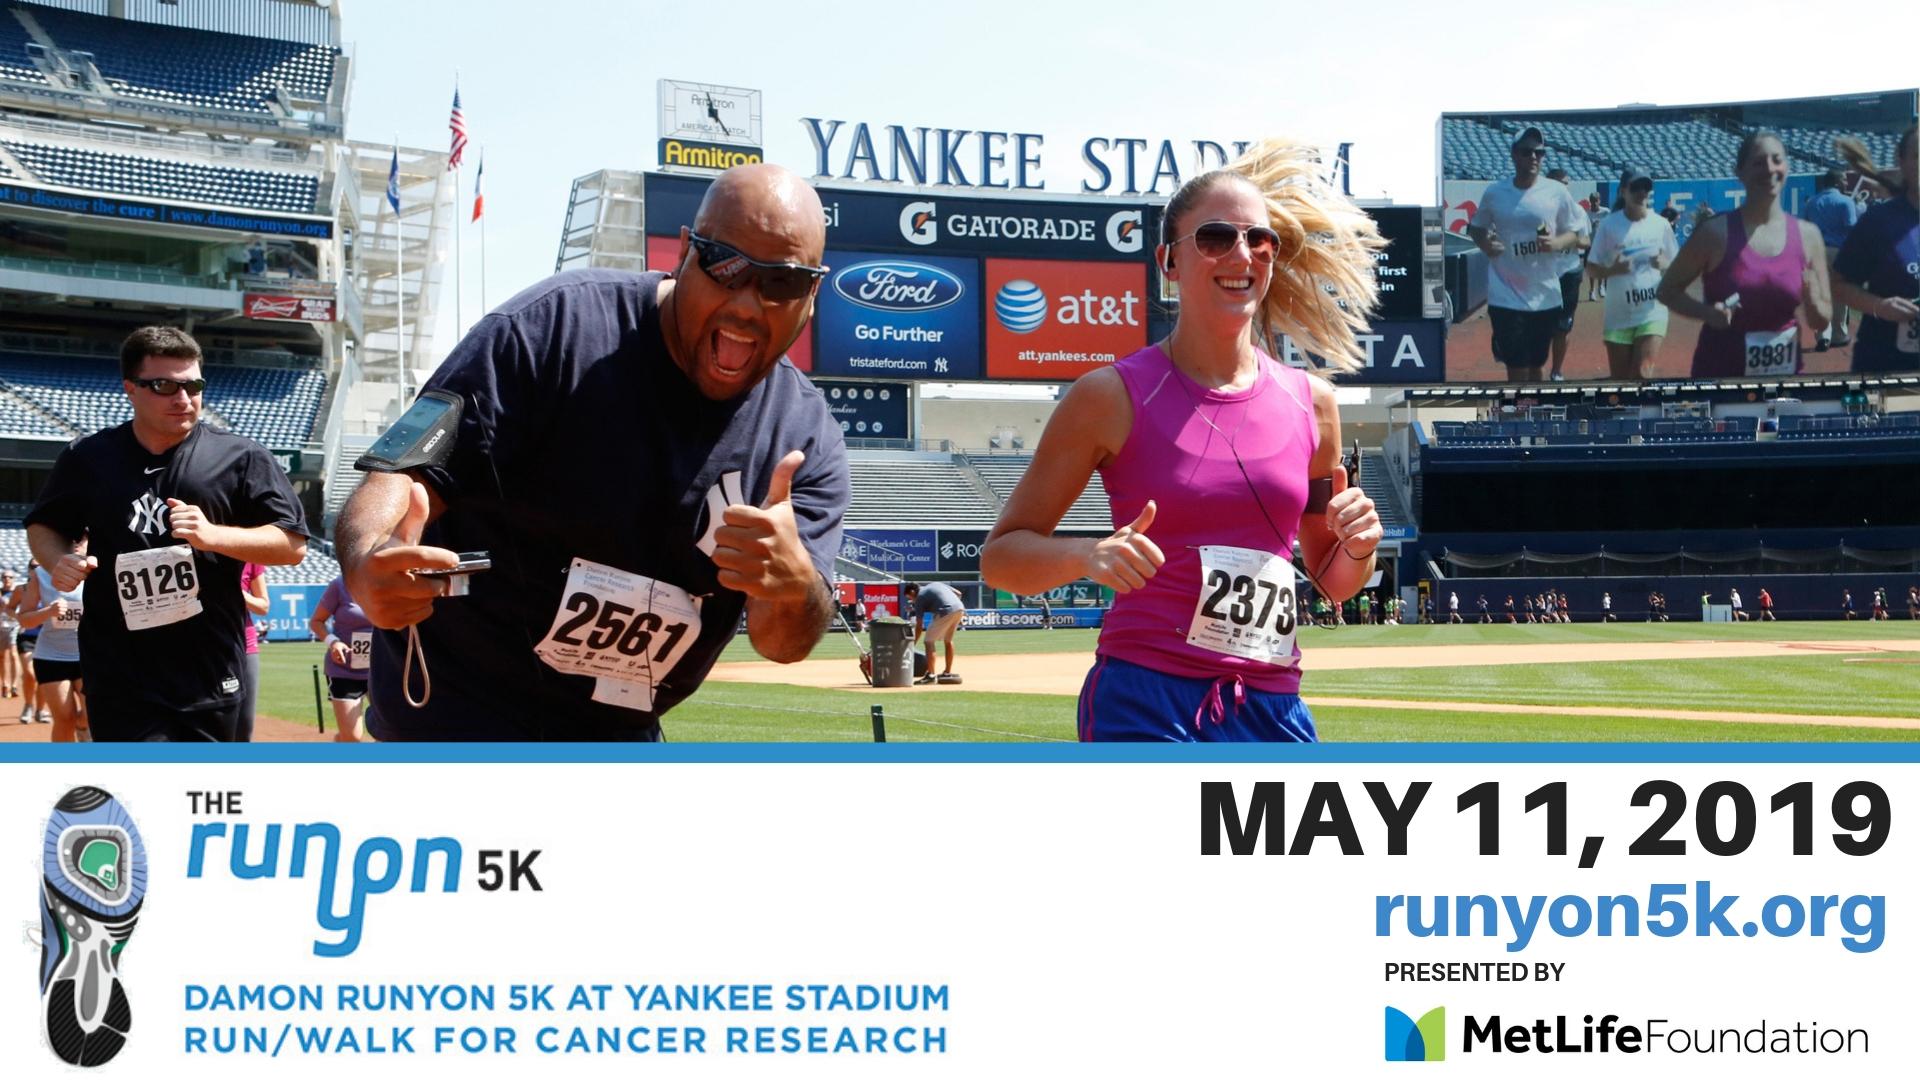 I'm running a 5K at Yankee Stadium